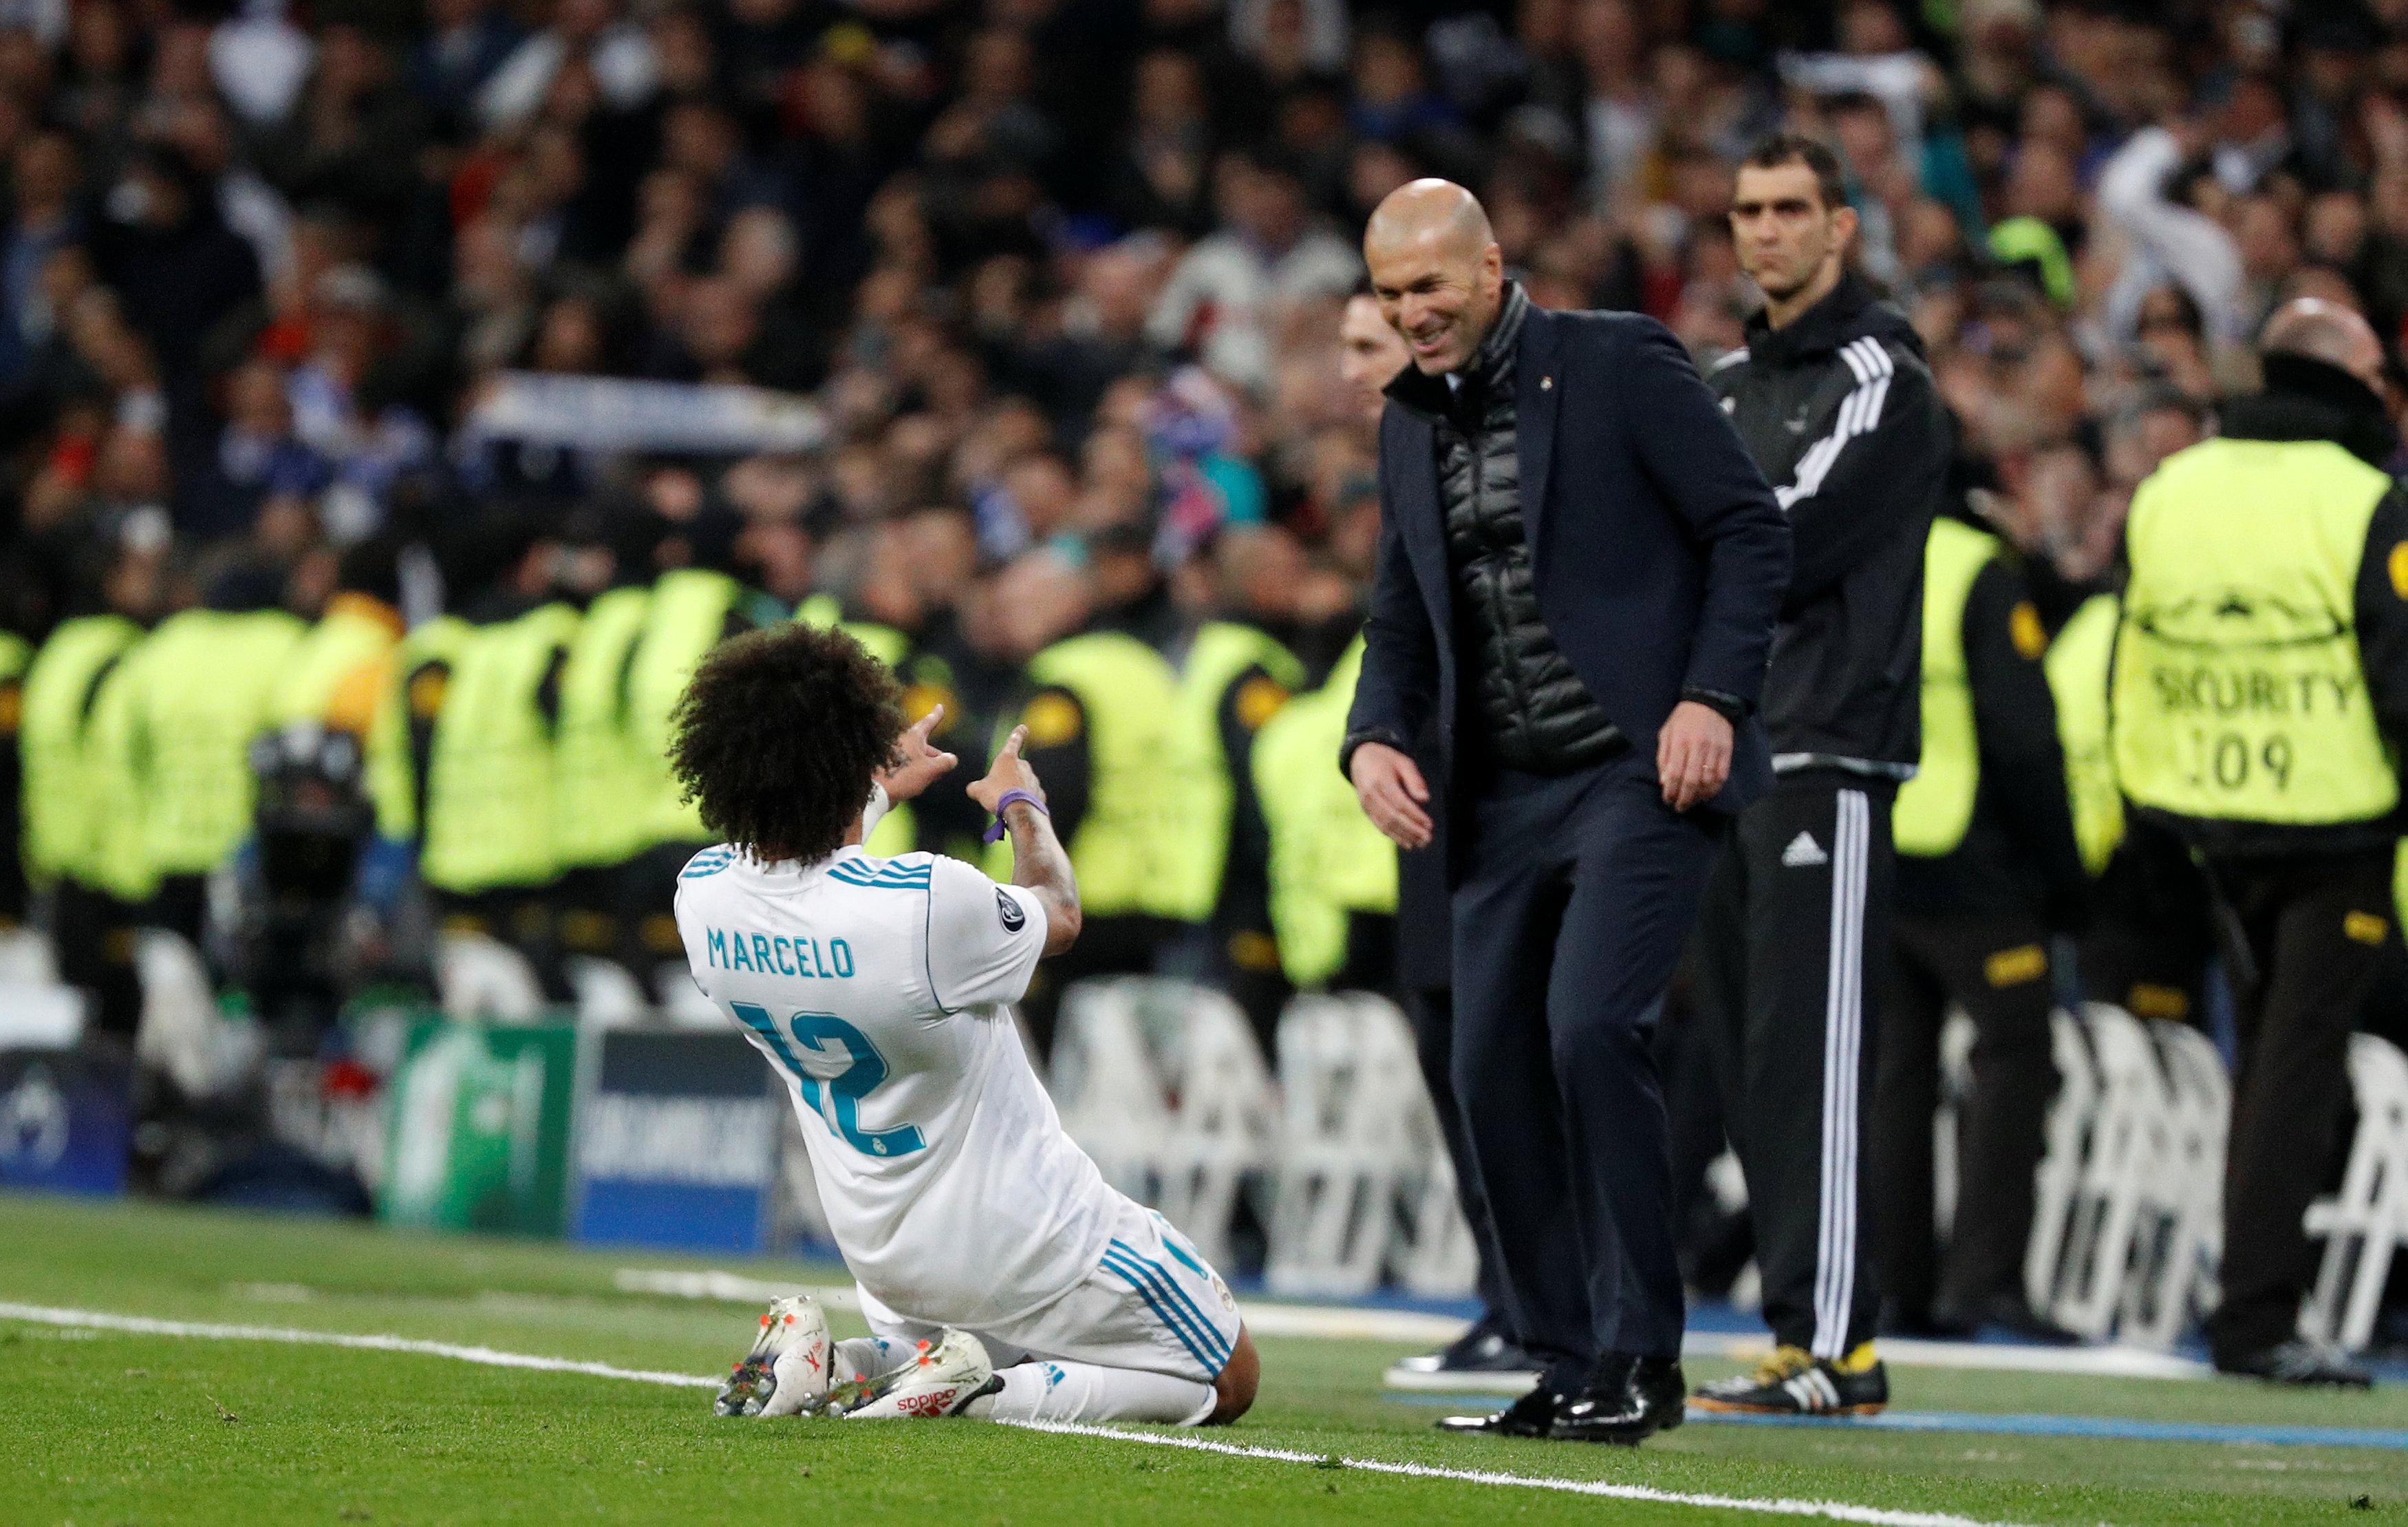 Zidane hoopt dat 'geweldige avond' tegen PSG begin is van stabiele serie